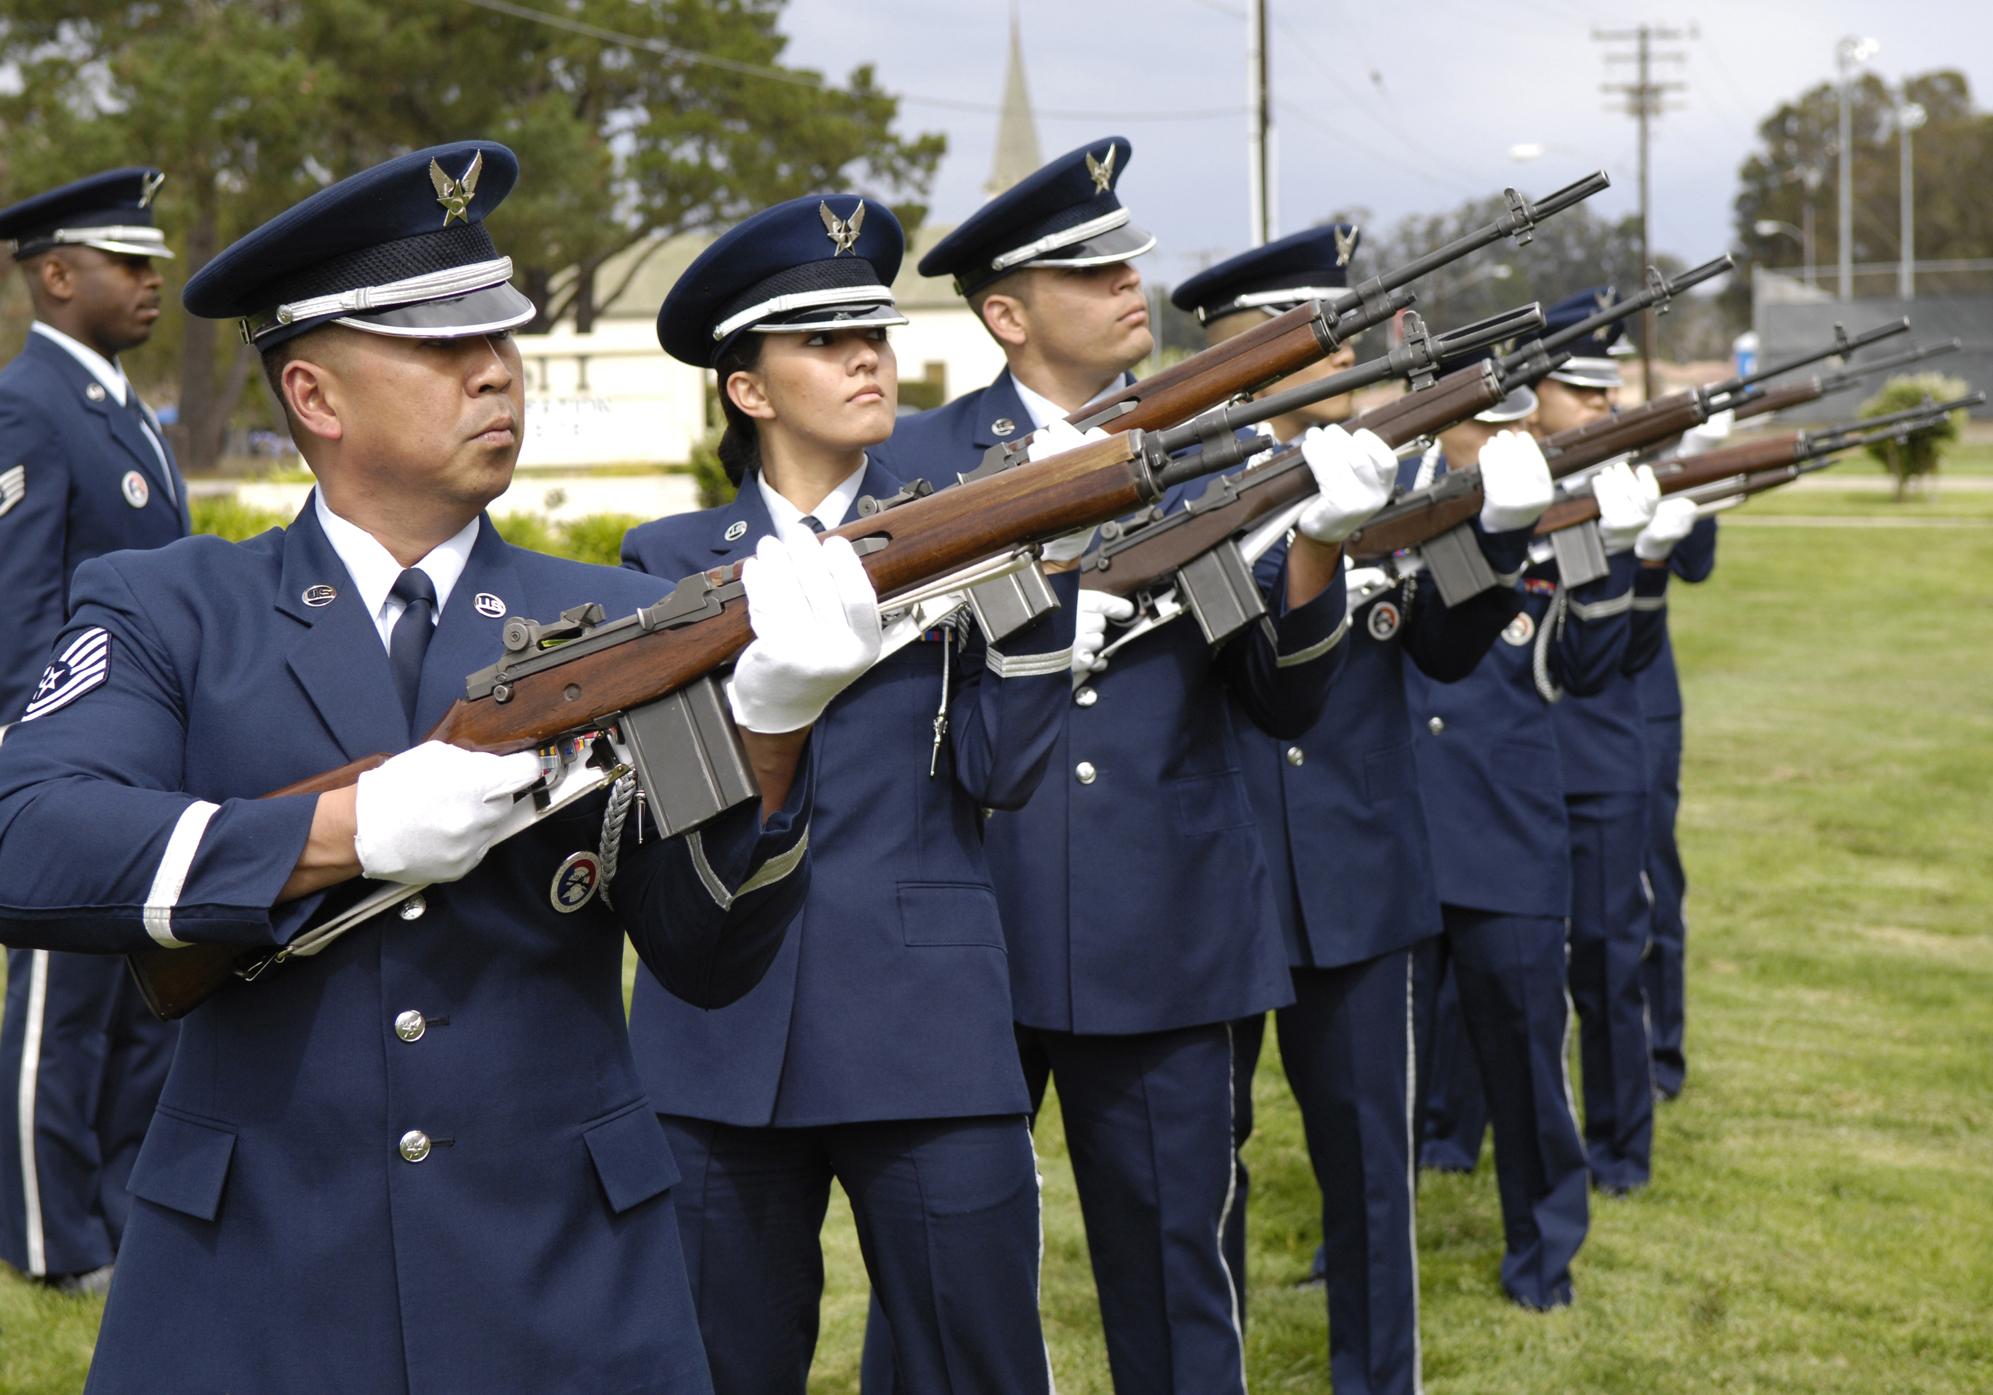 vandenberg air force base calif members of the base honor guard perform photo details download hi res